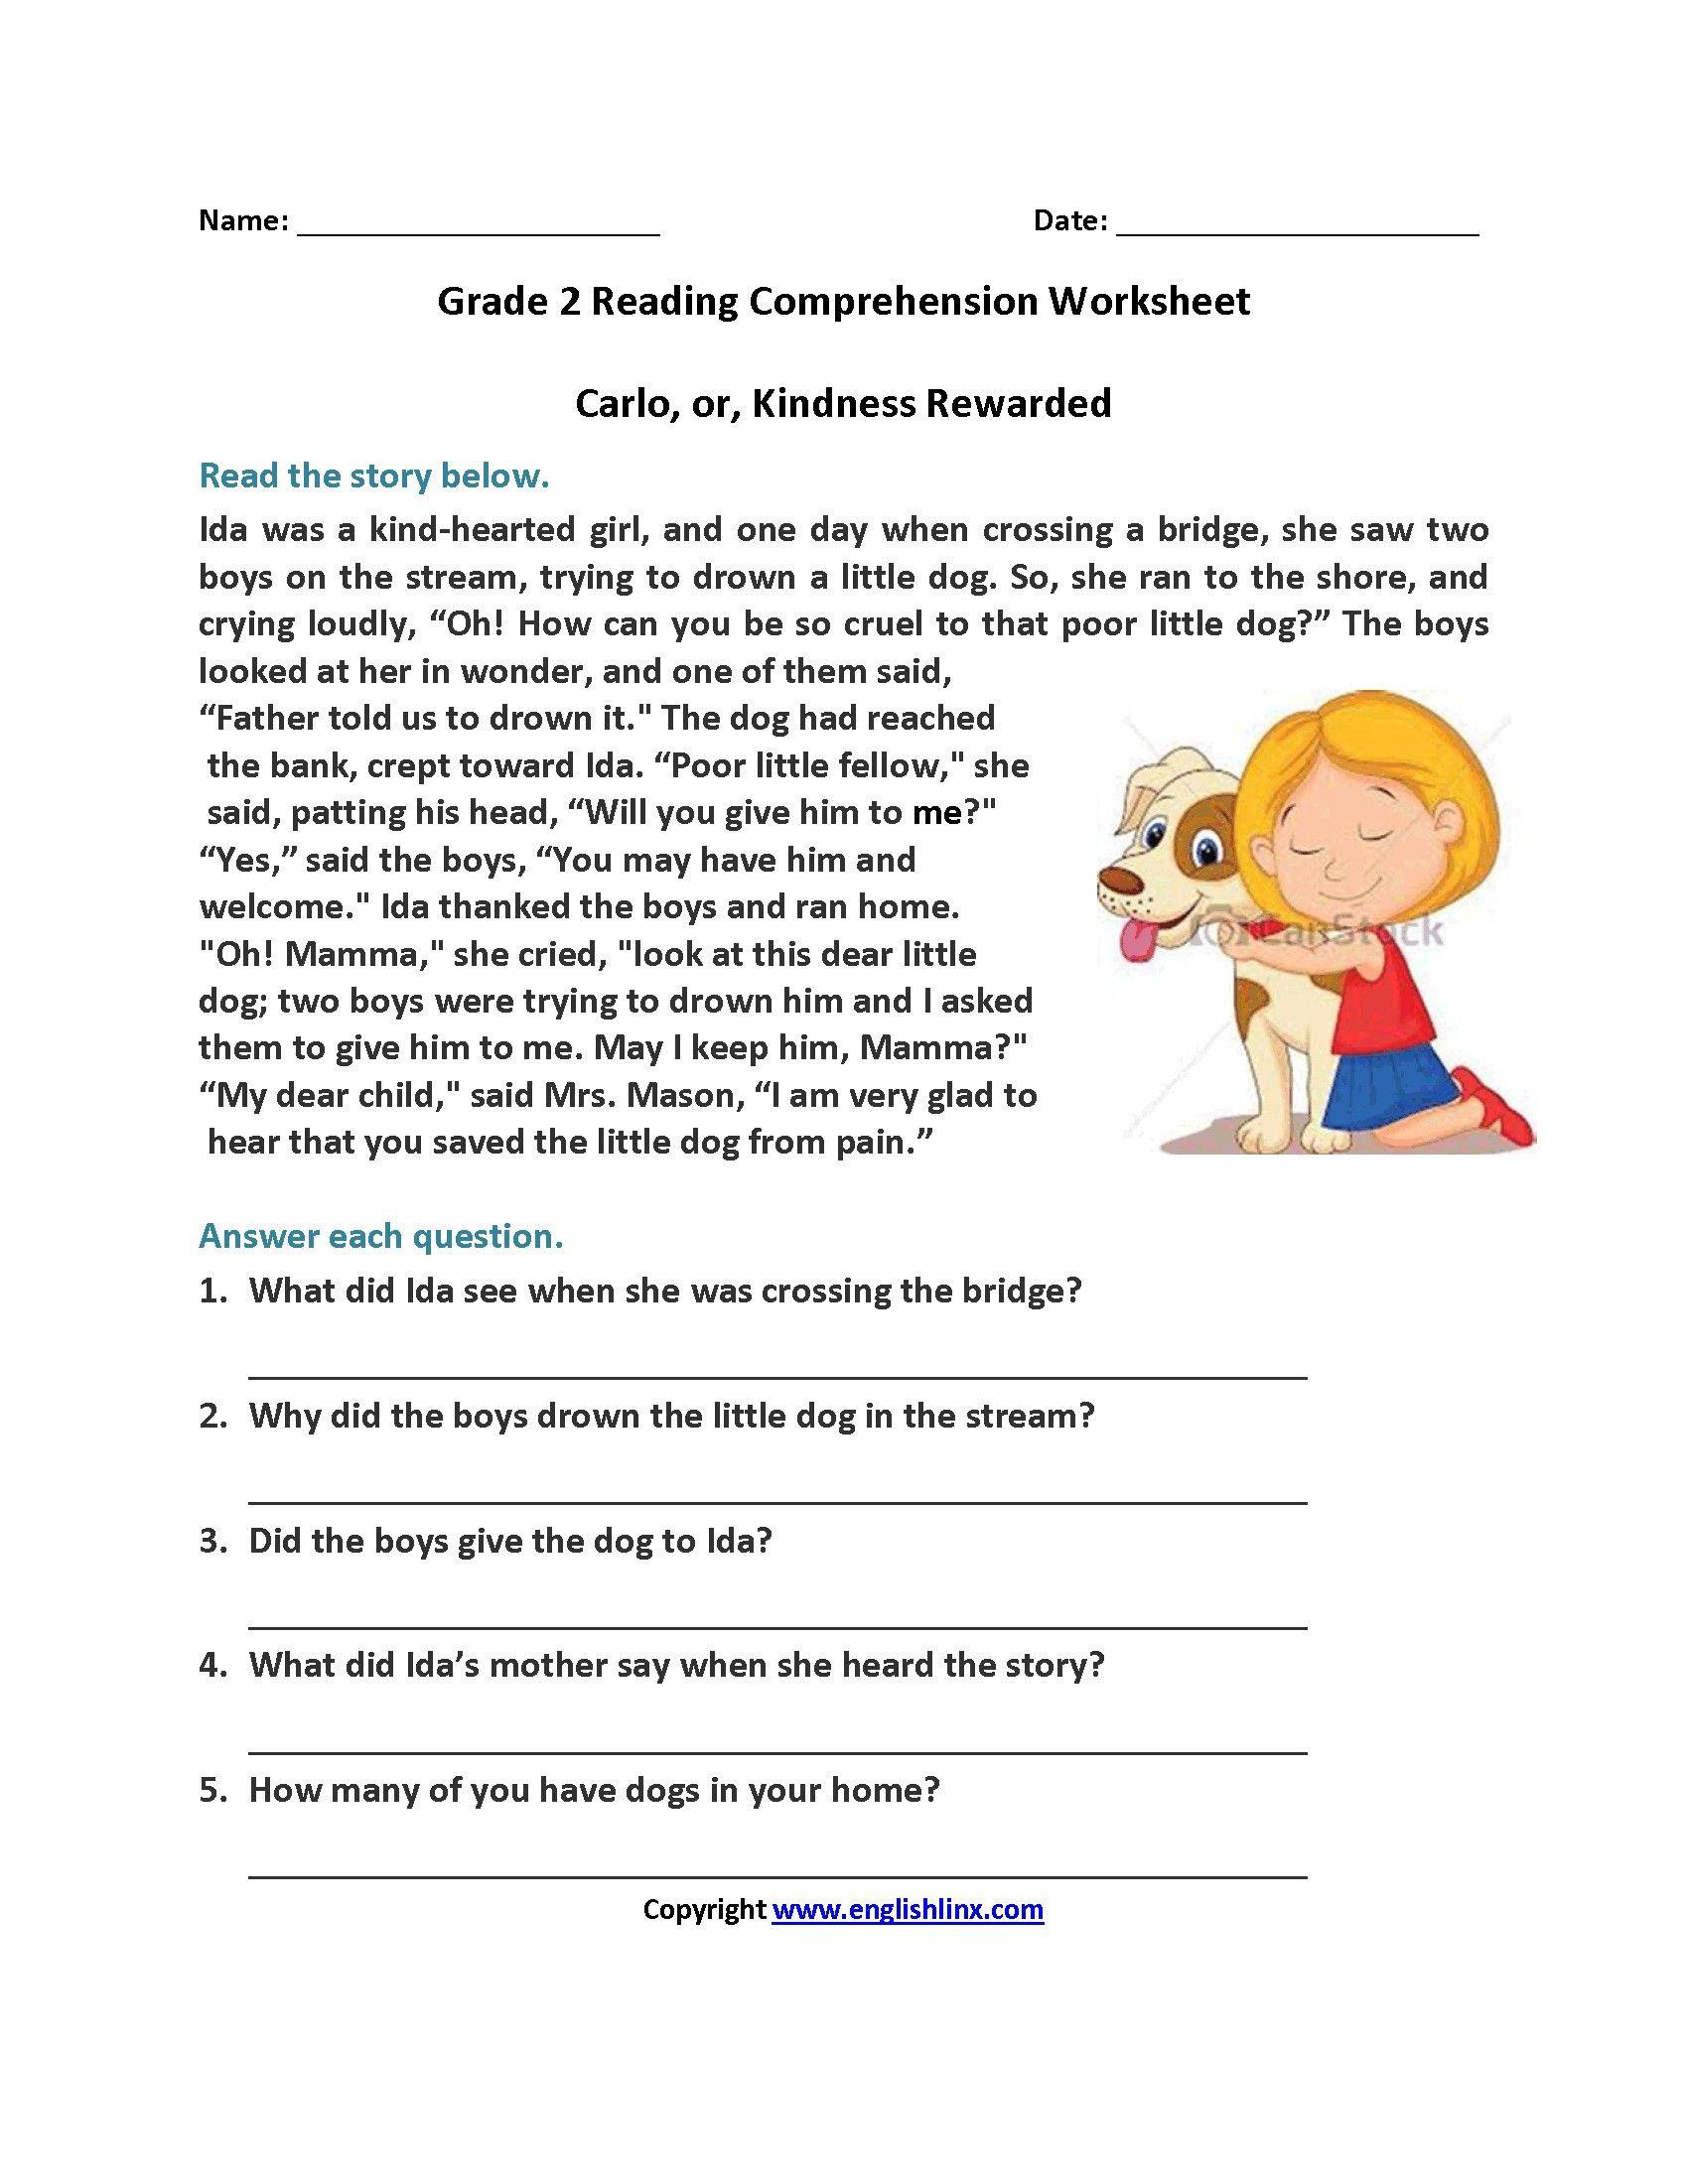 5 Grade 2 Reading Comprehension Worksheets Year 2 Preh 2nd Grade Reading Worksheets 3rd Grade Reading Comprehension Worksheets Reading Comprehension Worksheets